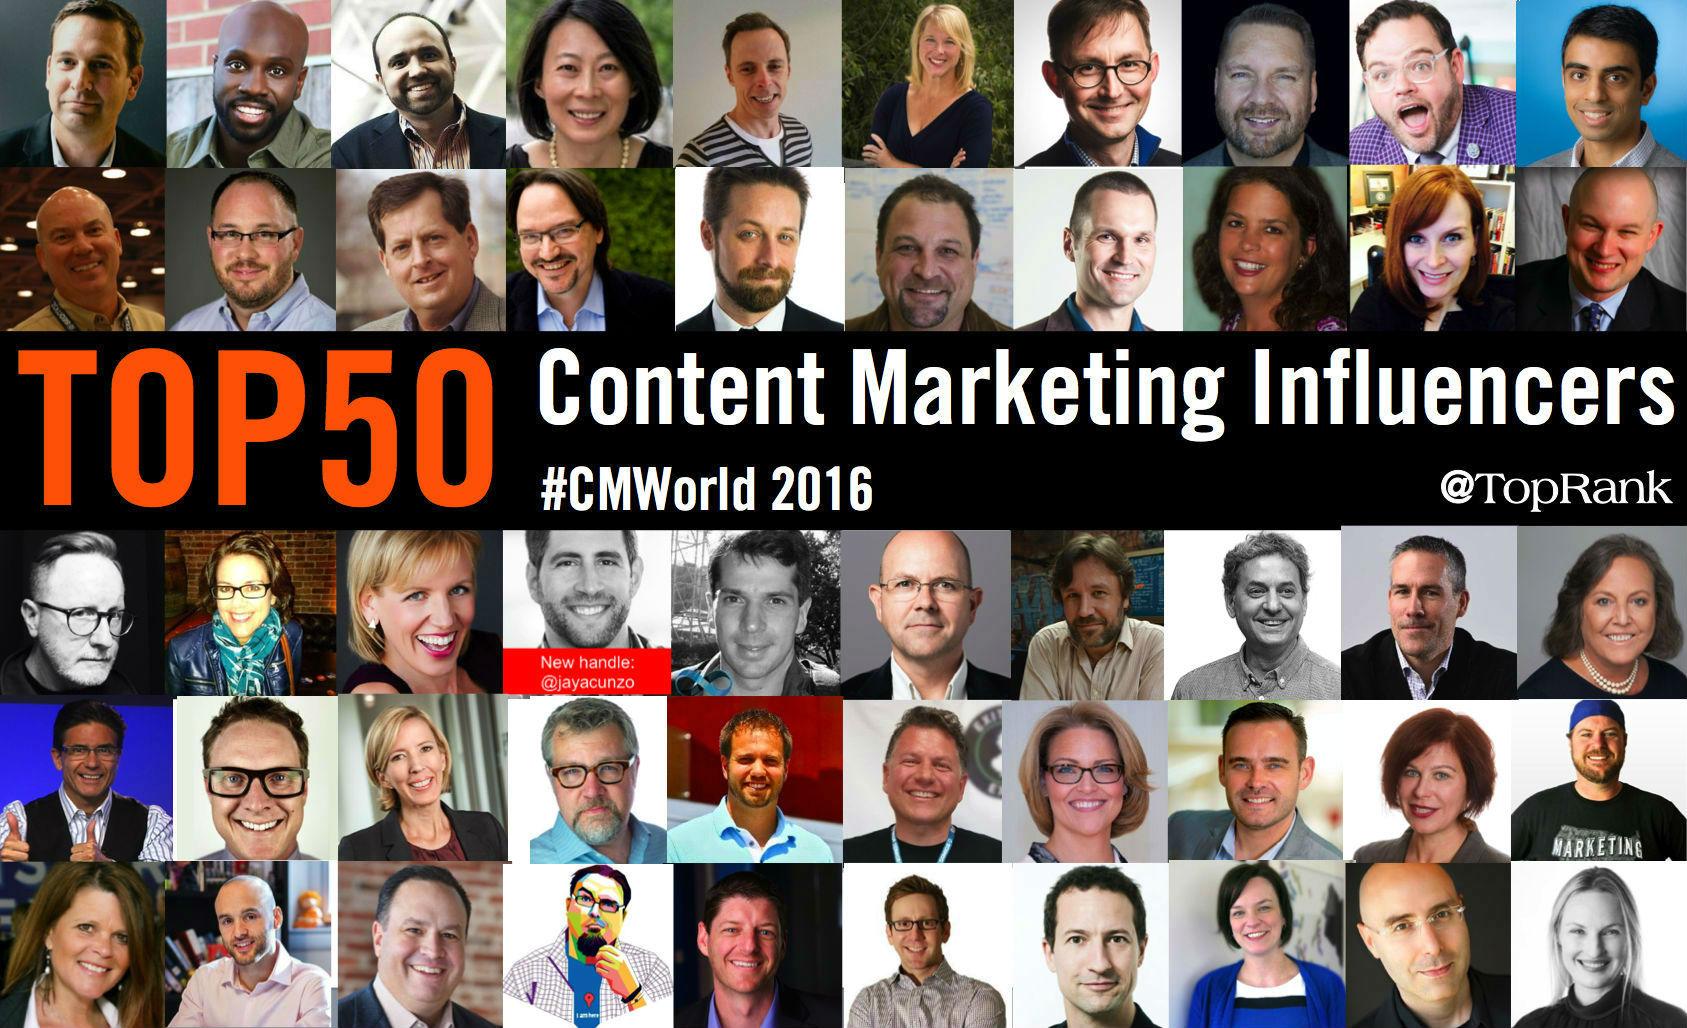 cmworld-influencers-2016-LG-2.jpg